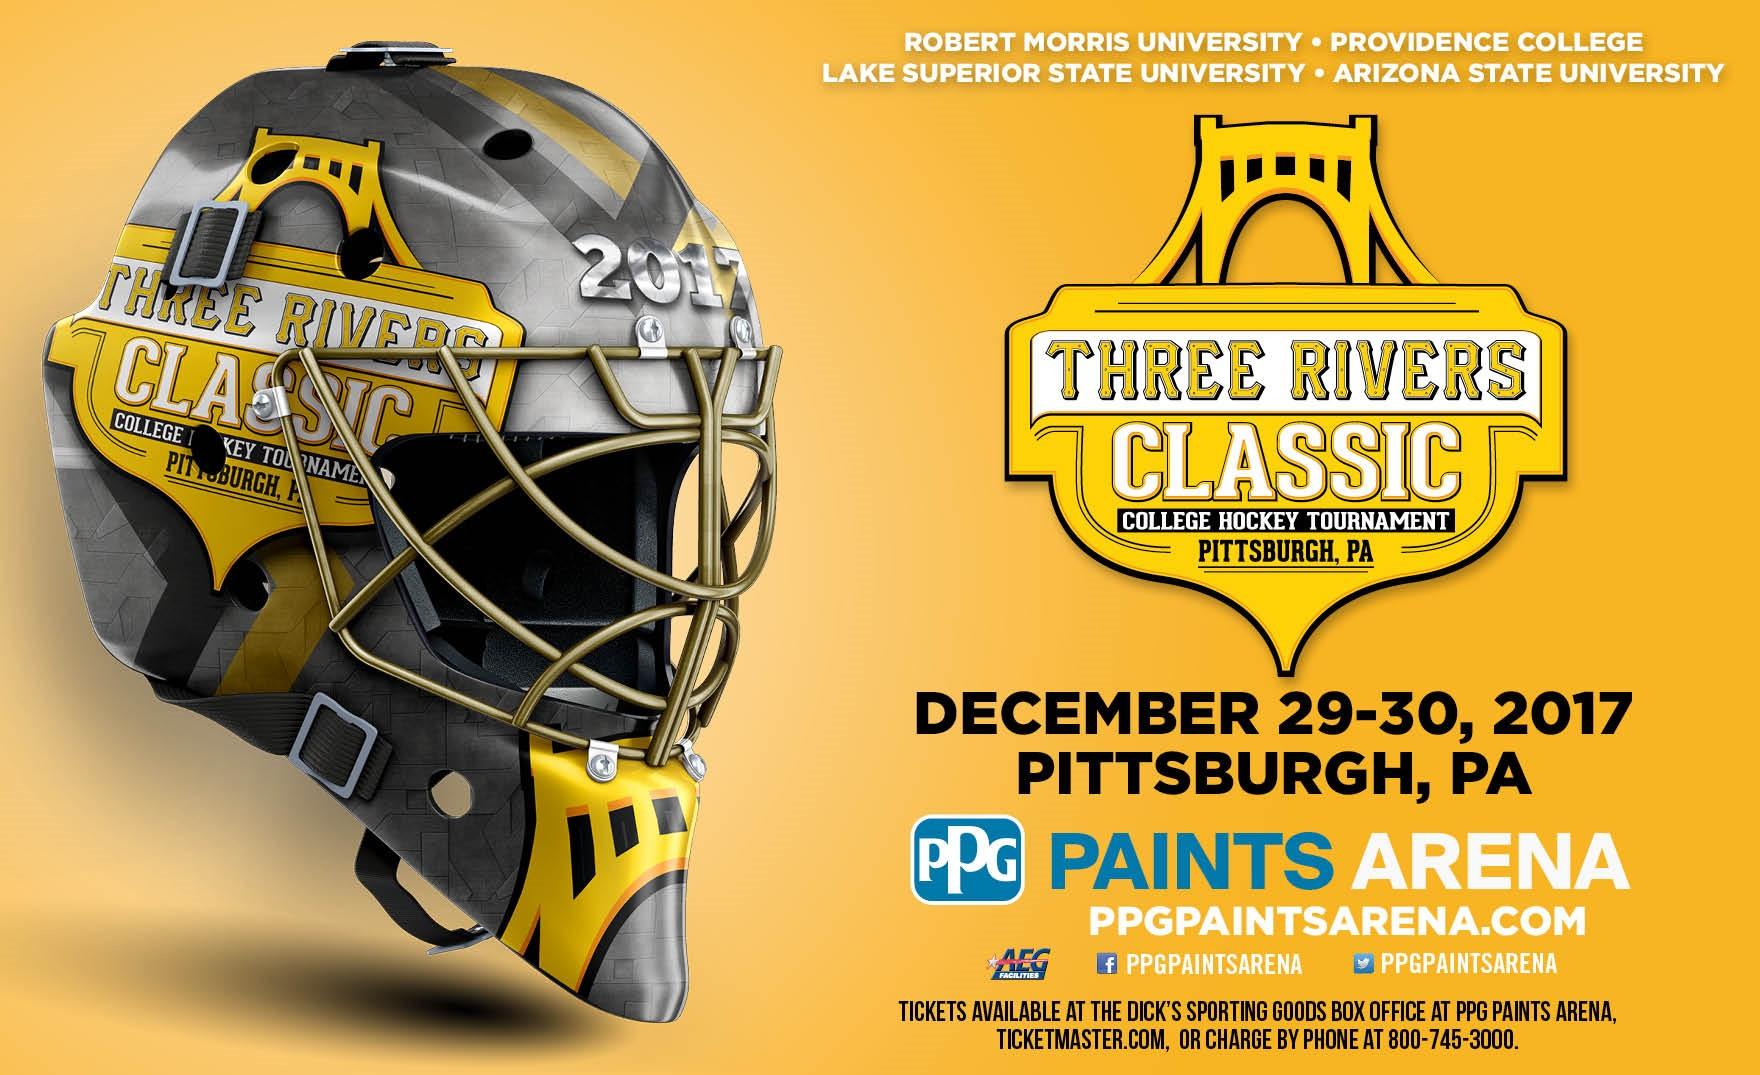 Three Rivers Classic Men S College Hockey Tournament Pittsburgh